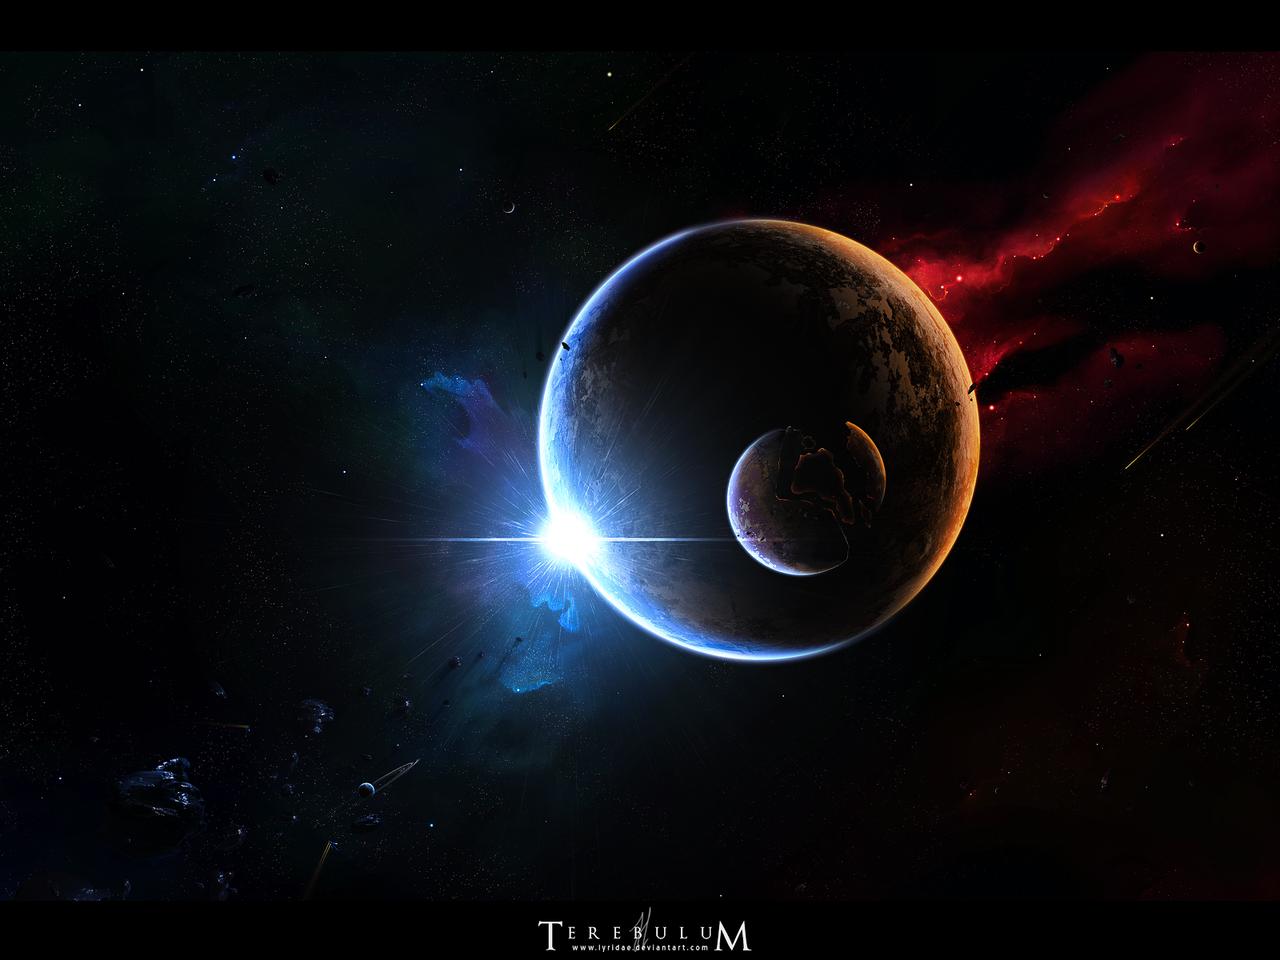 Terebulum by Lyridae